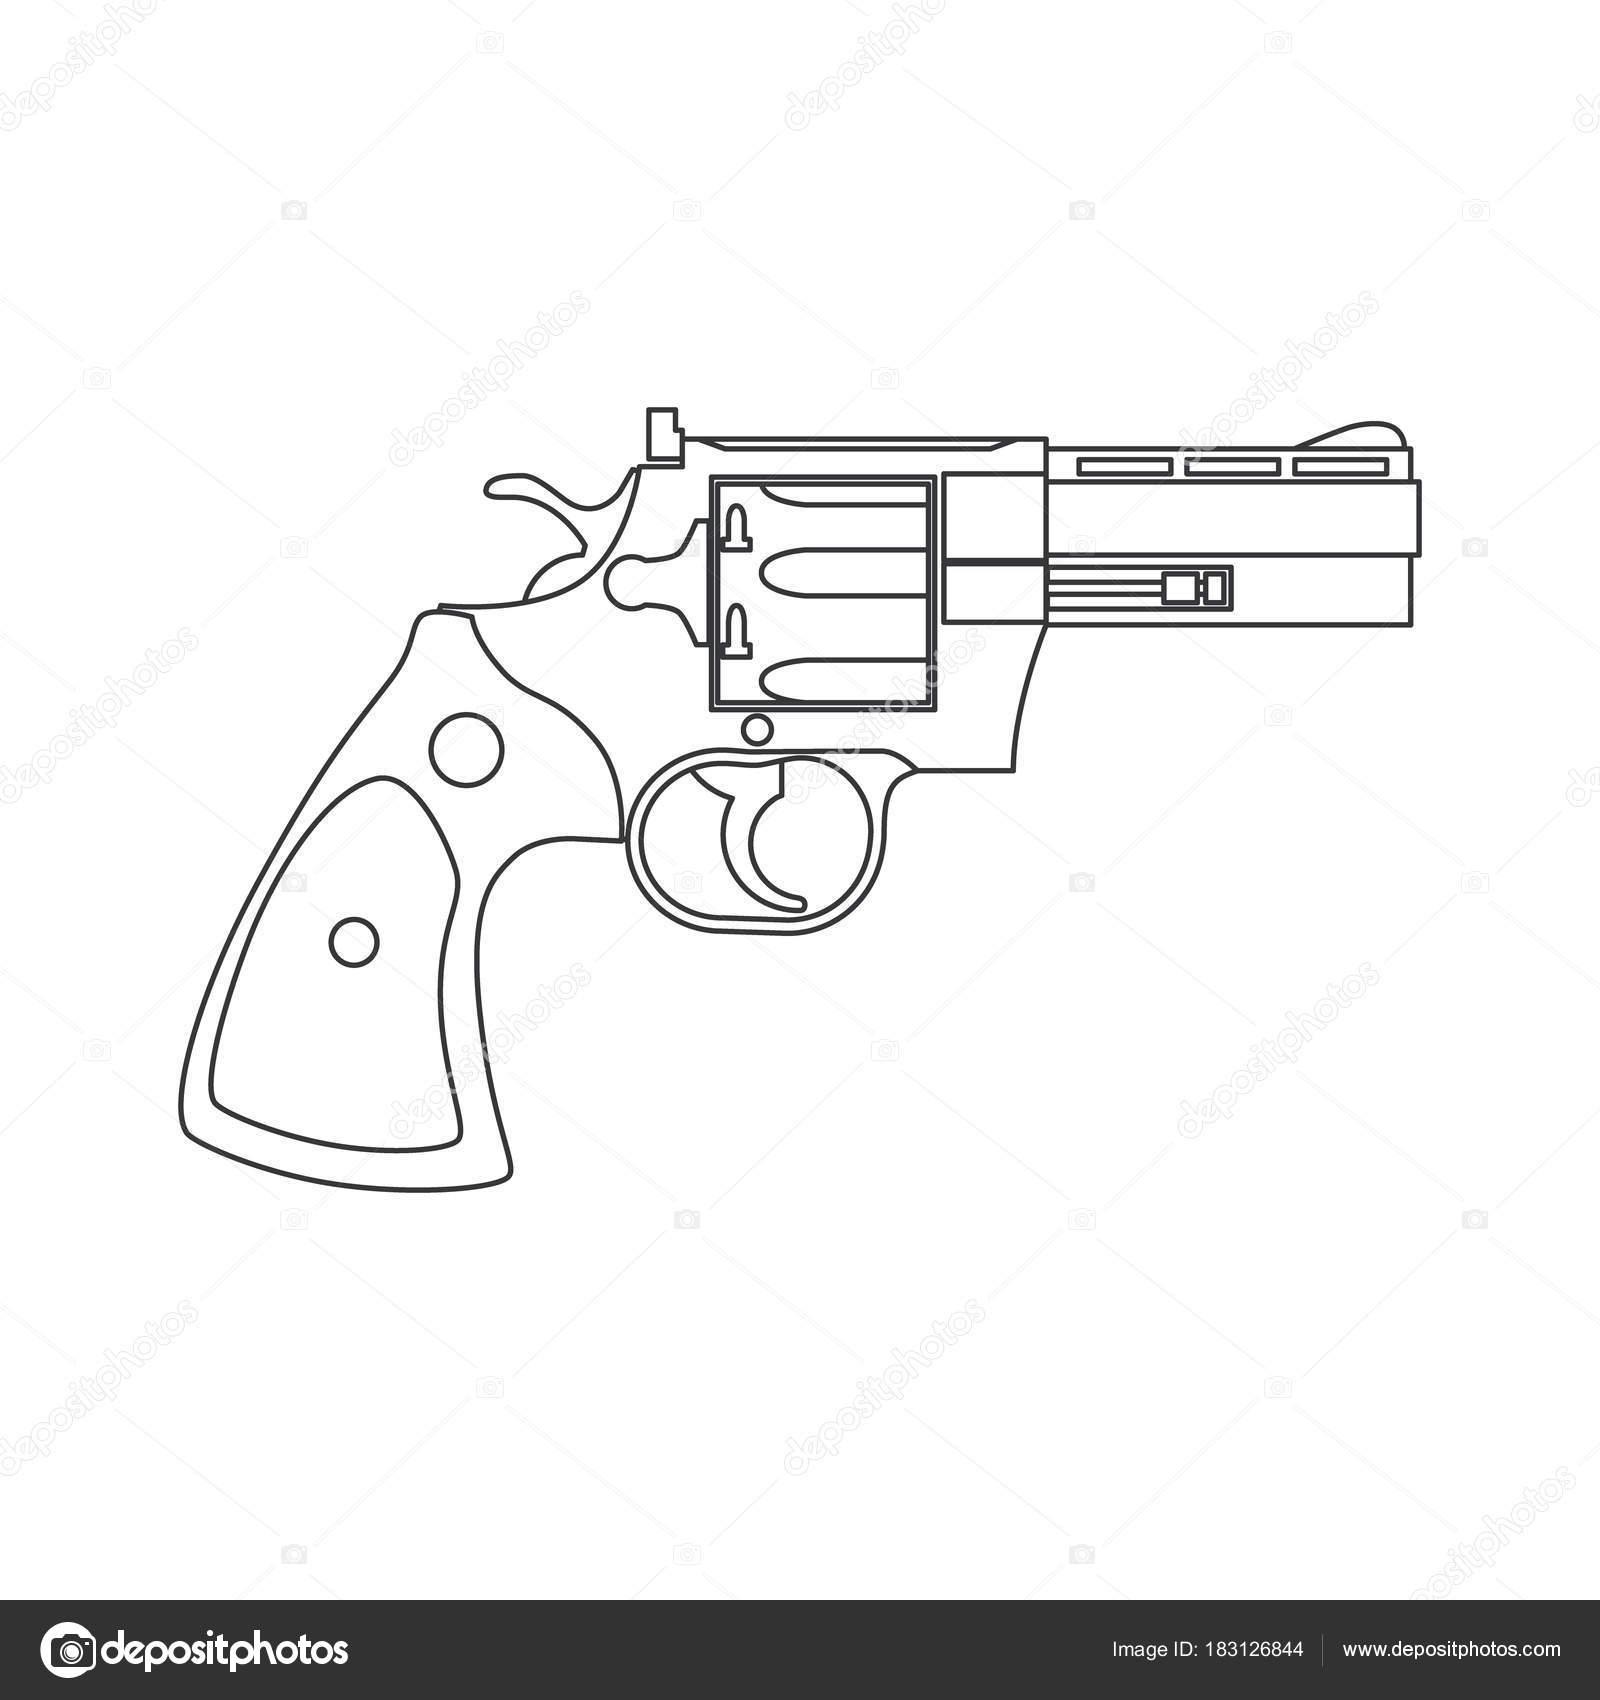 Imágenes Pistola De Pintar Dibujo Pistola Revólver